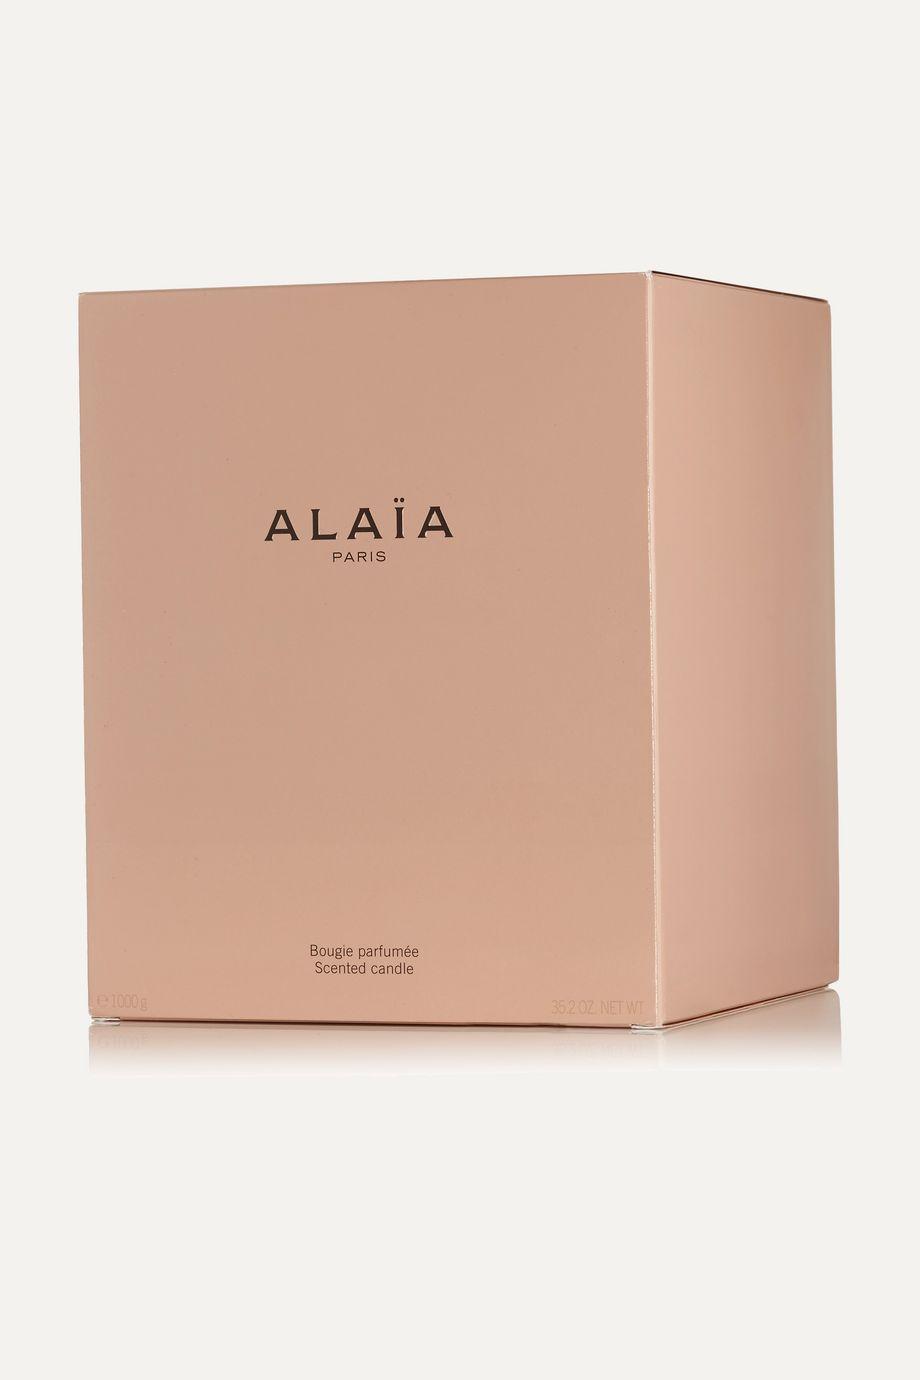 Alaïa Beauty ALAÏA PARIS Scented Candle, 1000g